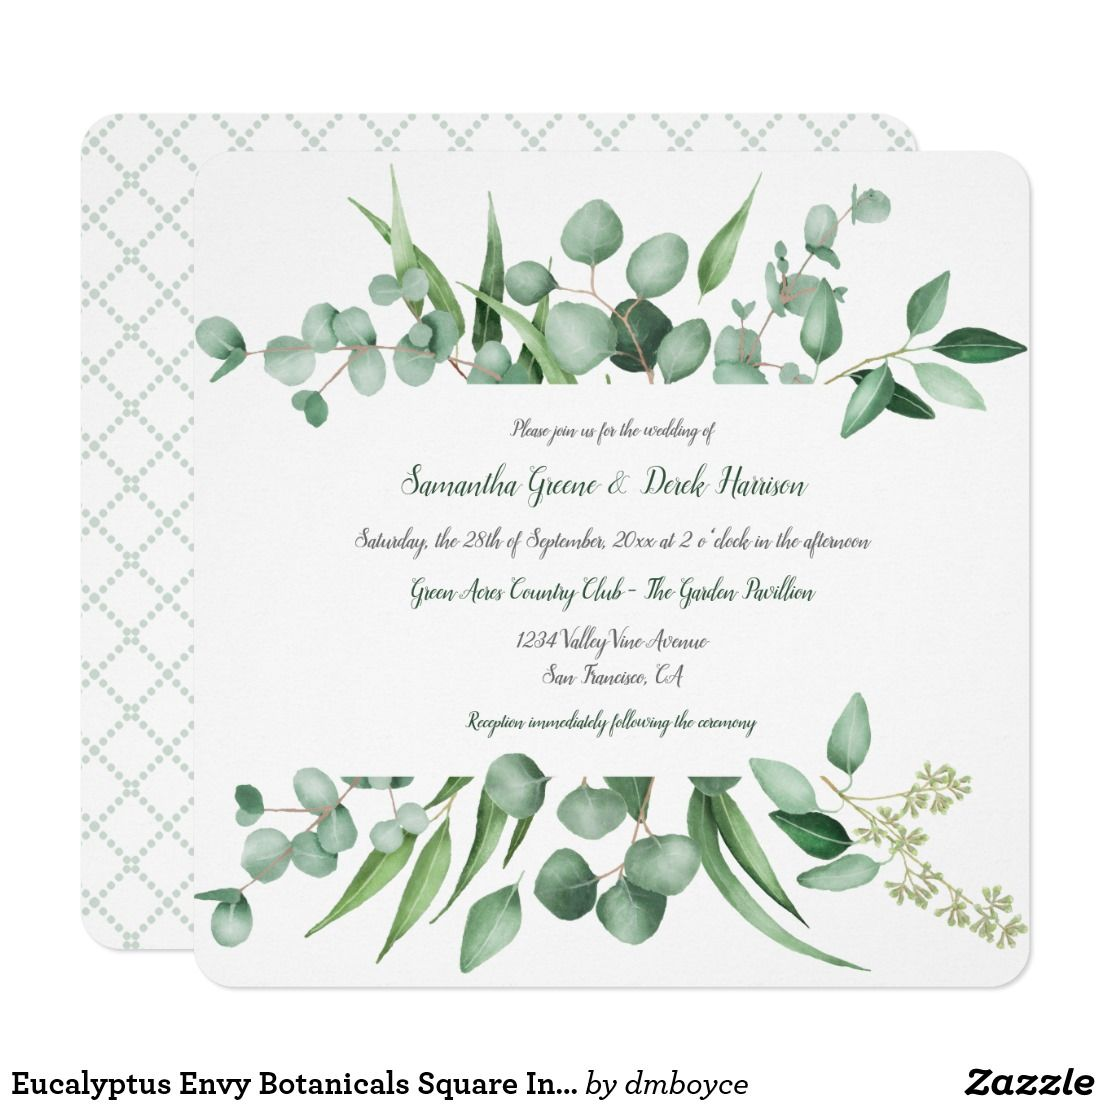 Eucalyptus Envy Botanicals Square Invitations Watercolor Wedding